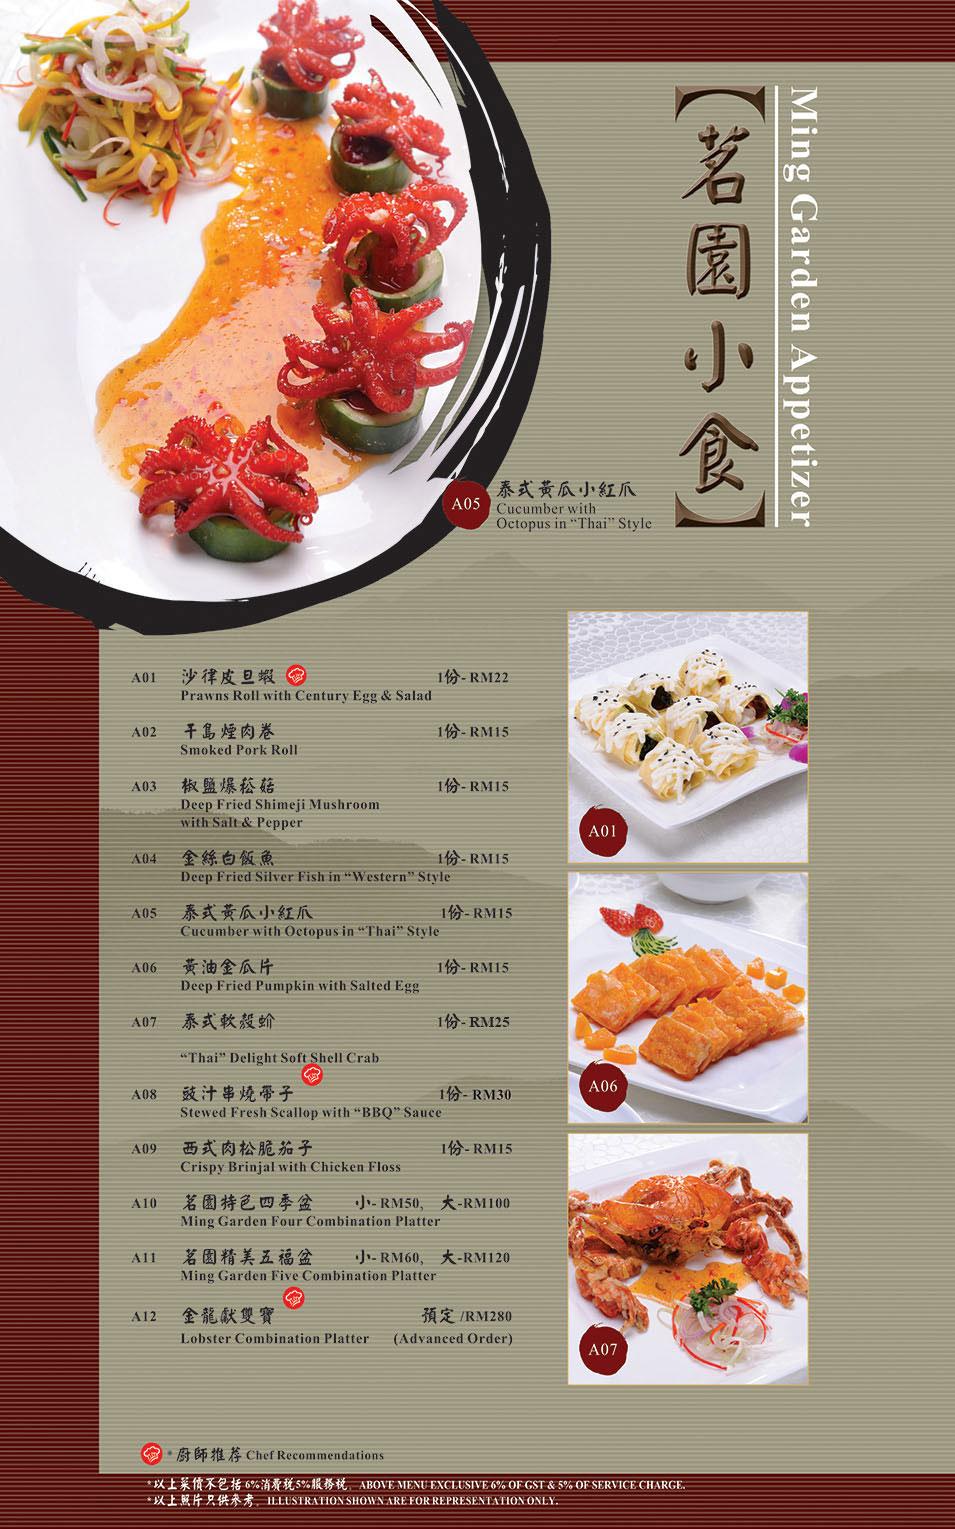 Ming Garden Kenosha Ming Garden Chinese Restaurant Kenosha Menu Fasci Garden De 10 Bsta